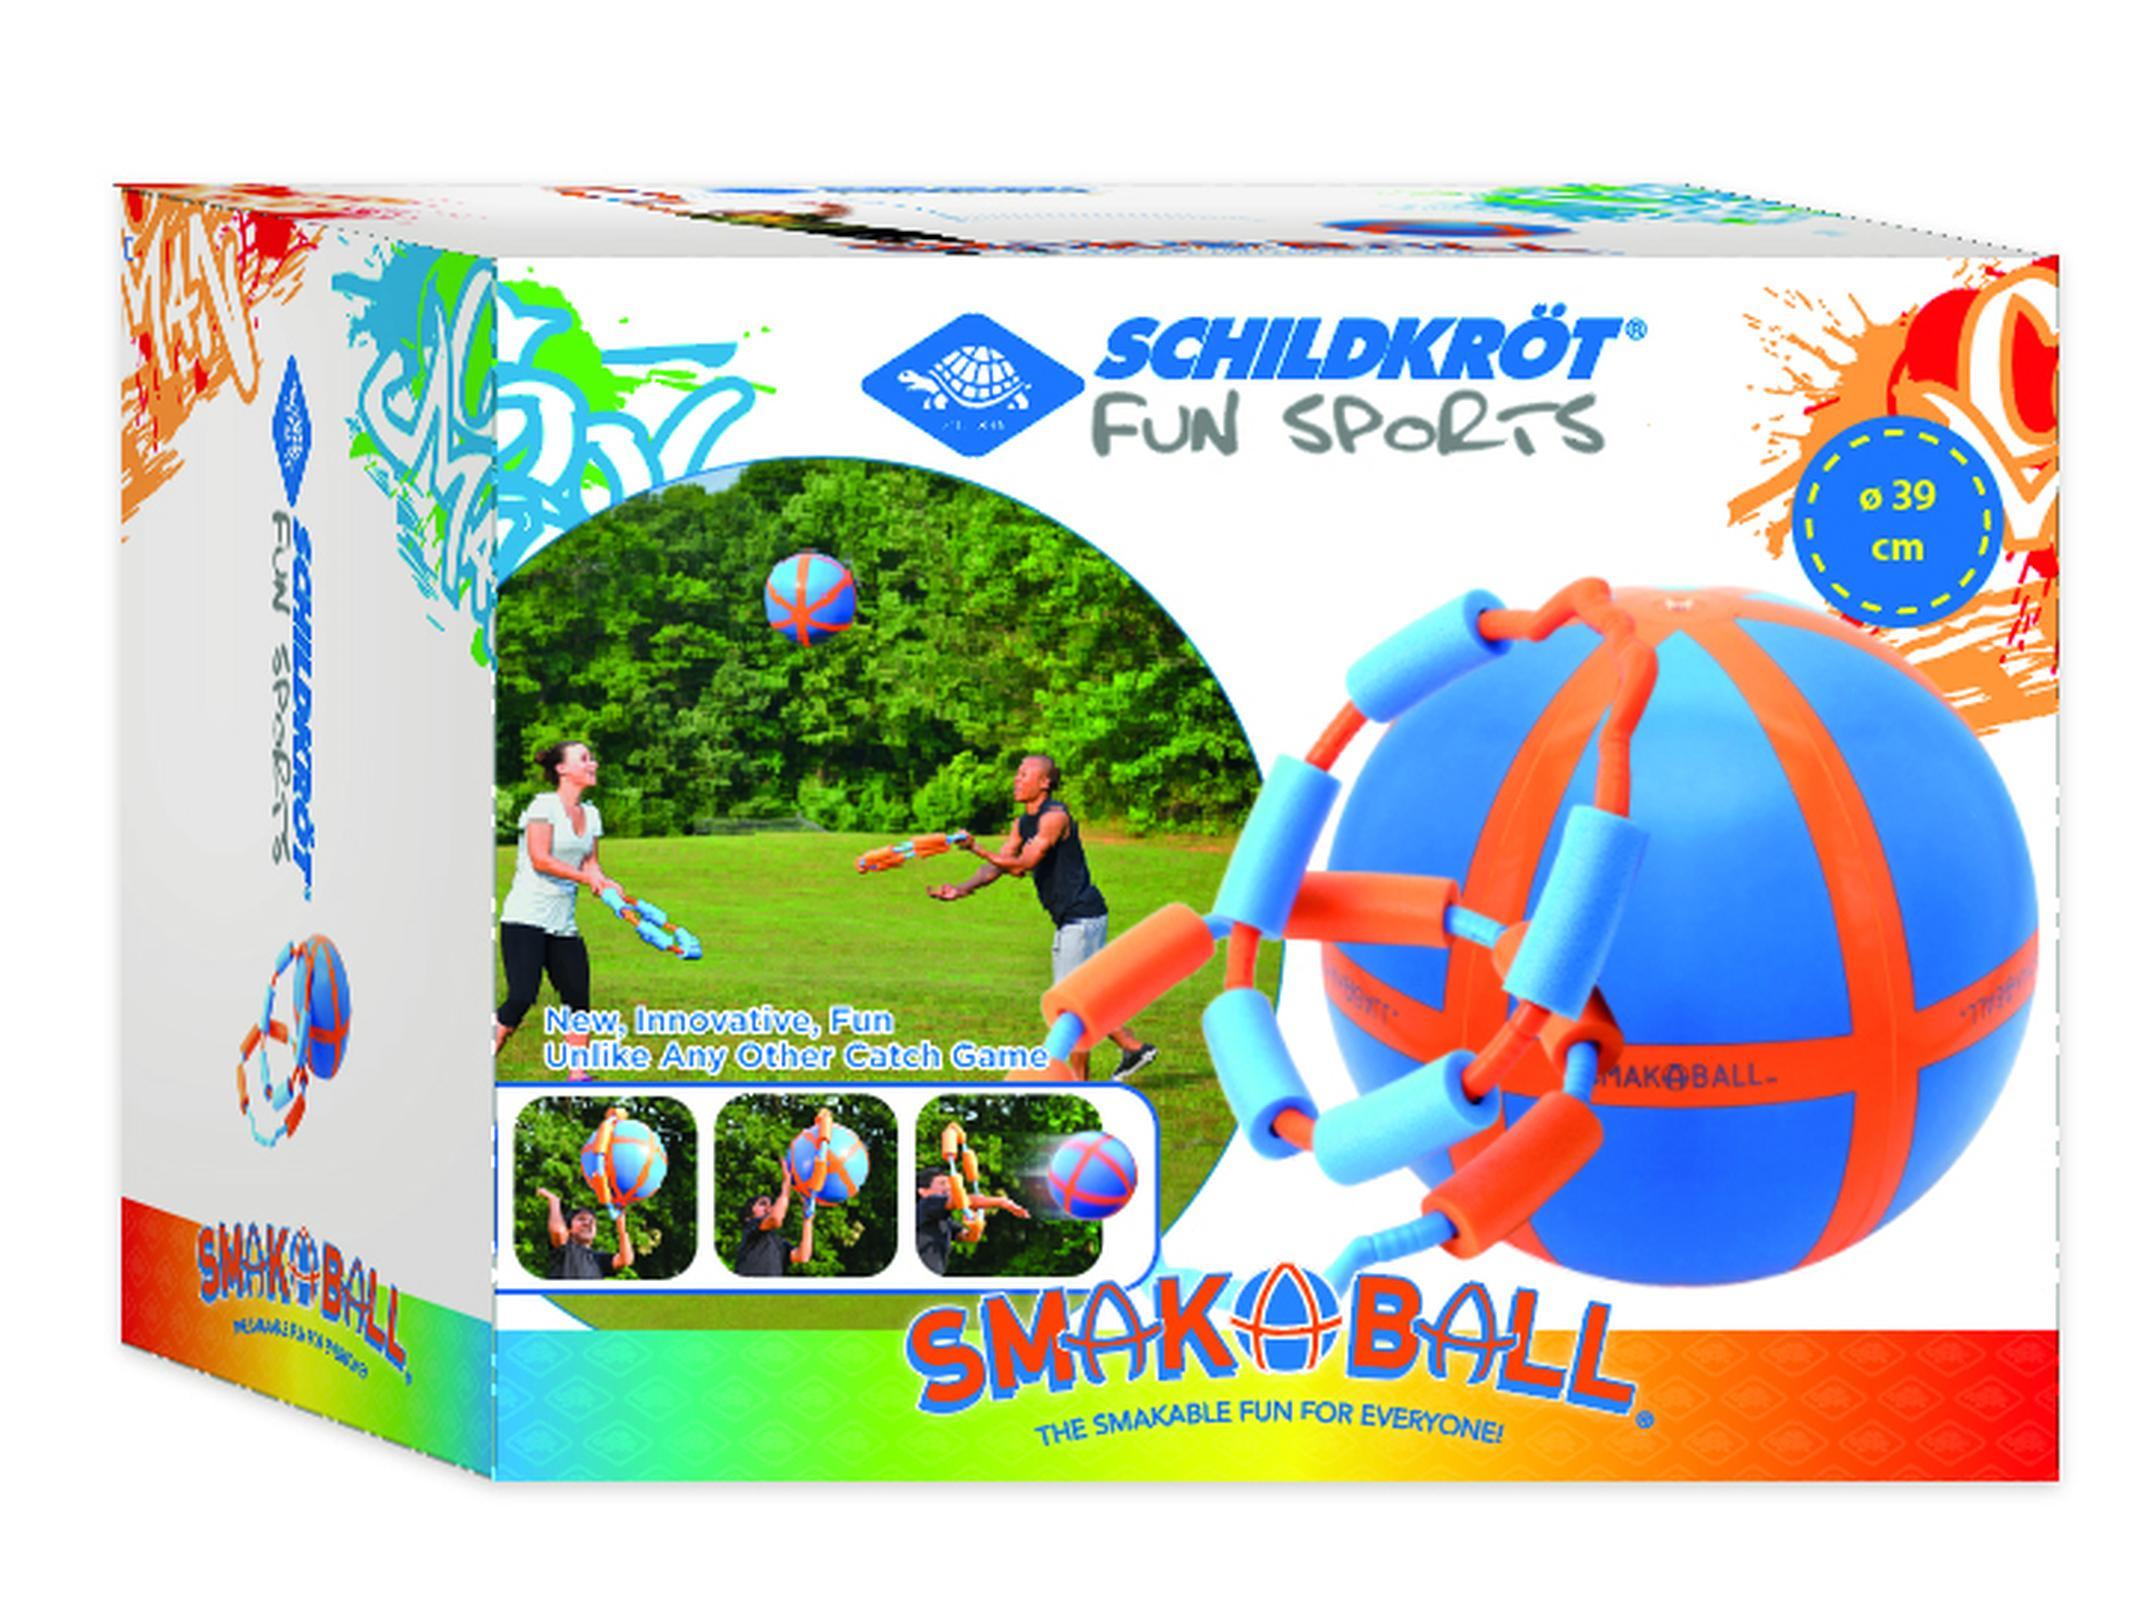 New Sports Federbälle bunt 6 Stück Ballset Bälle für Badminton Ersatzbälle Neu Badminton